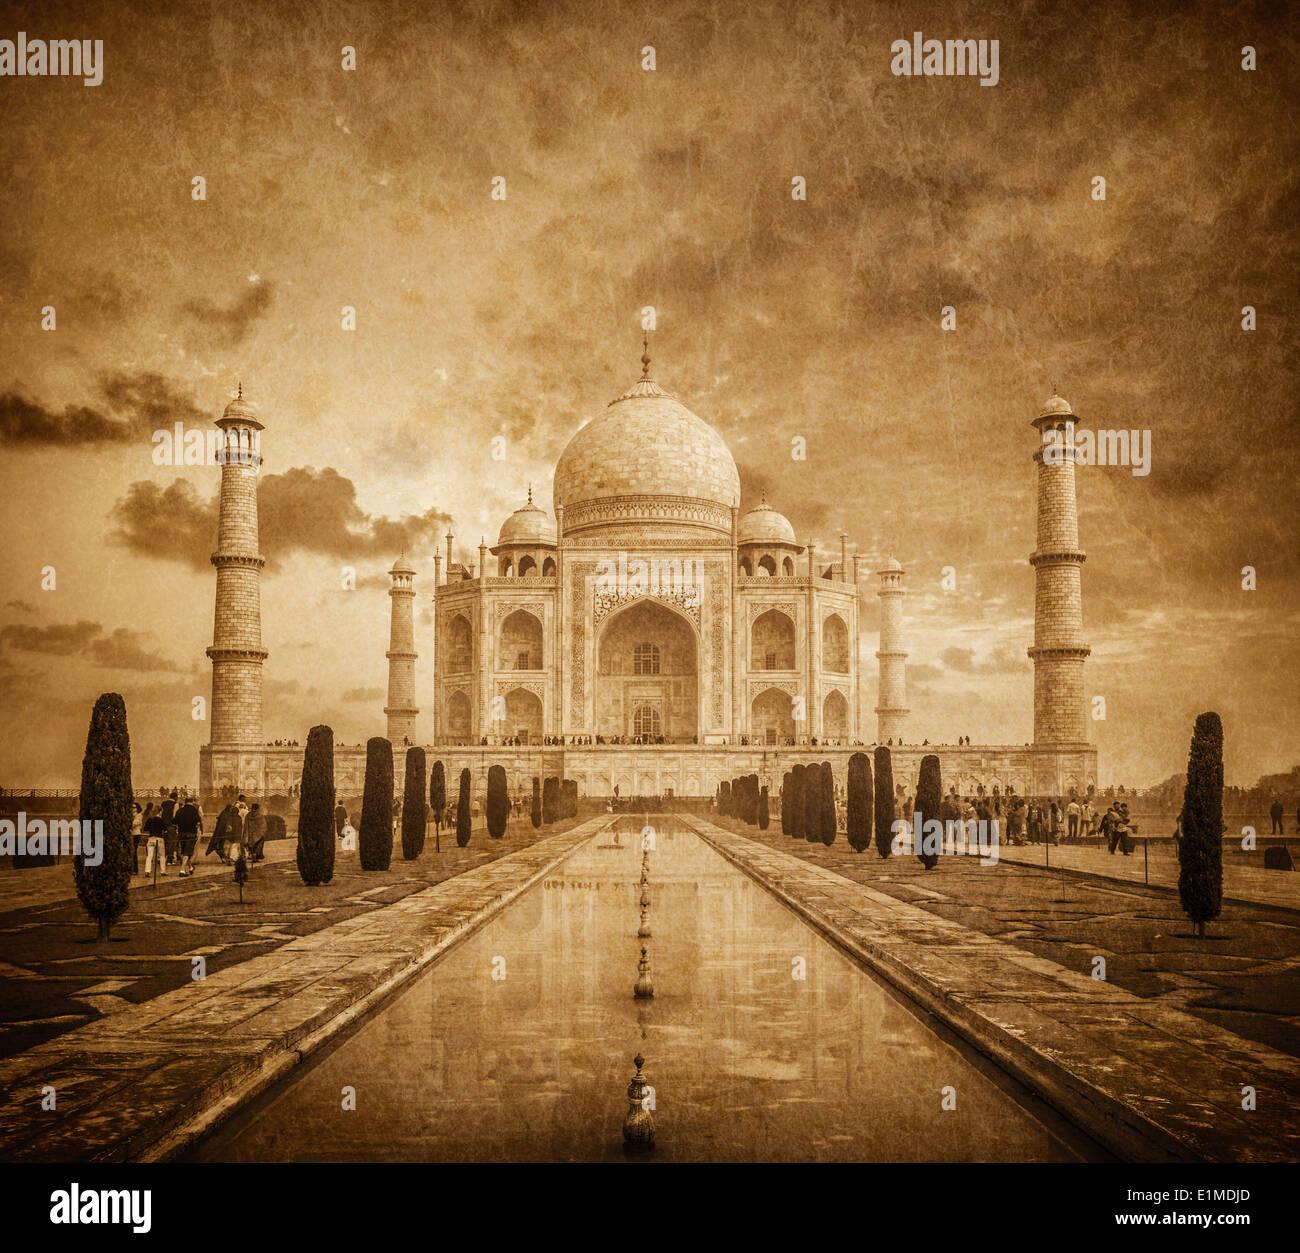 Taj Mahal imagen vintage. Símbolo indio - viajes de India de fondo. Agra, Uttar Pradesh, India Imagen De Stock